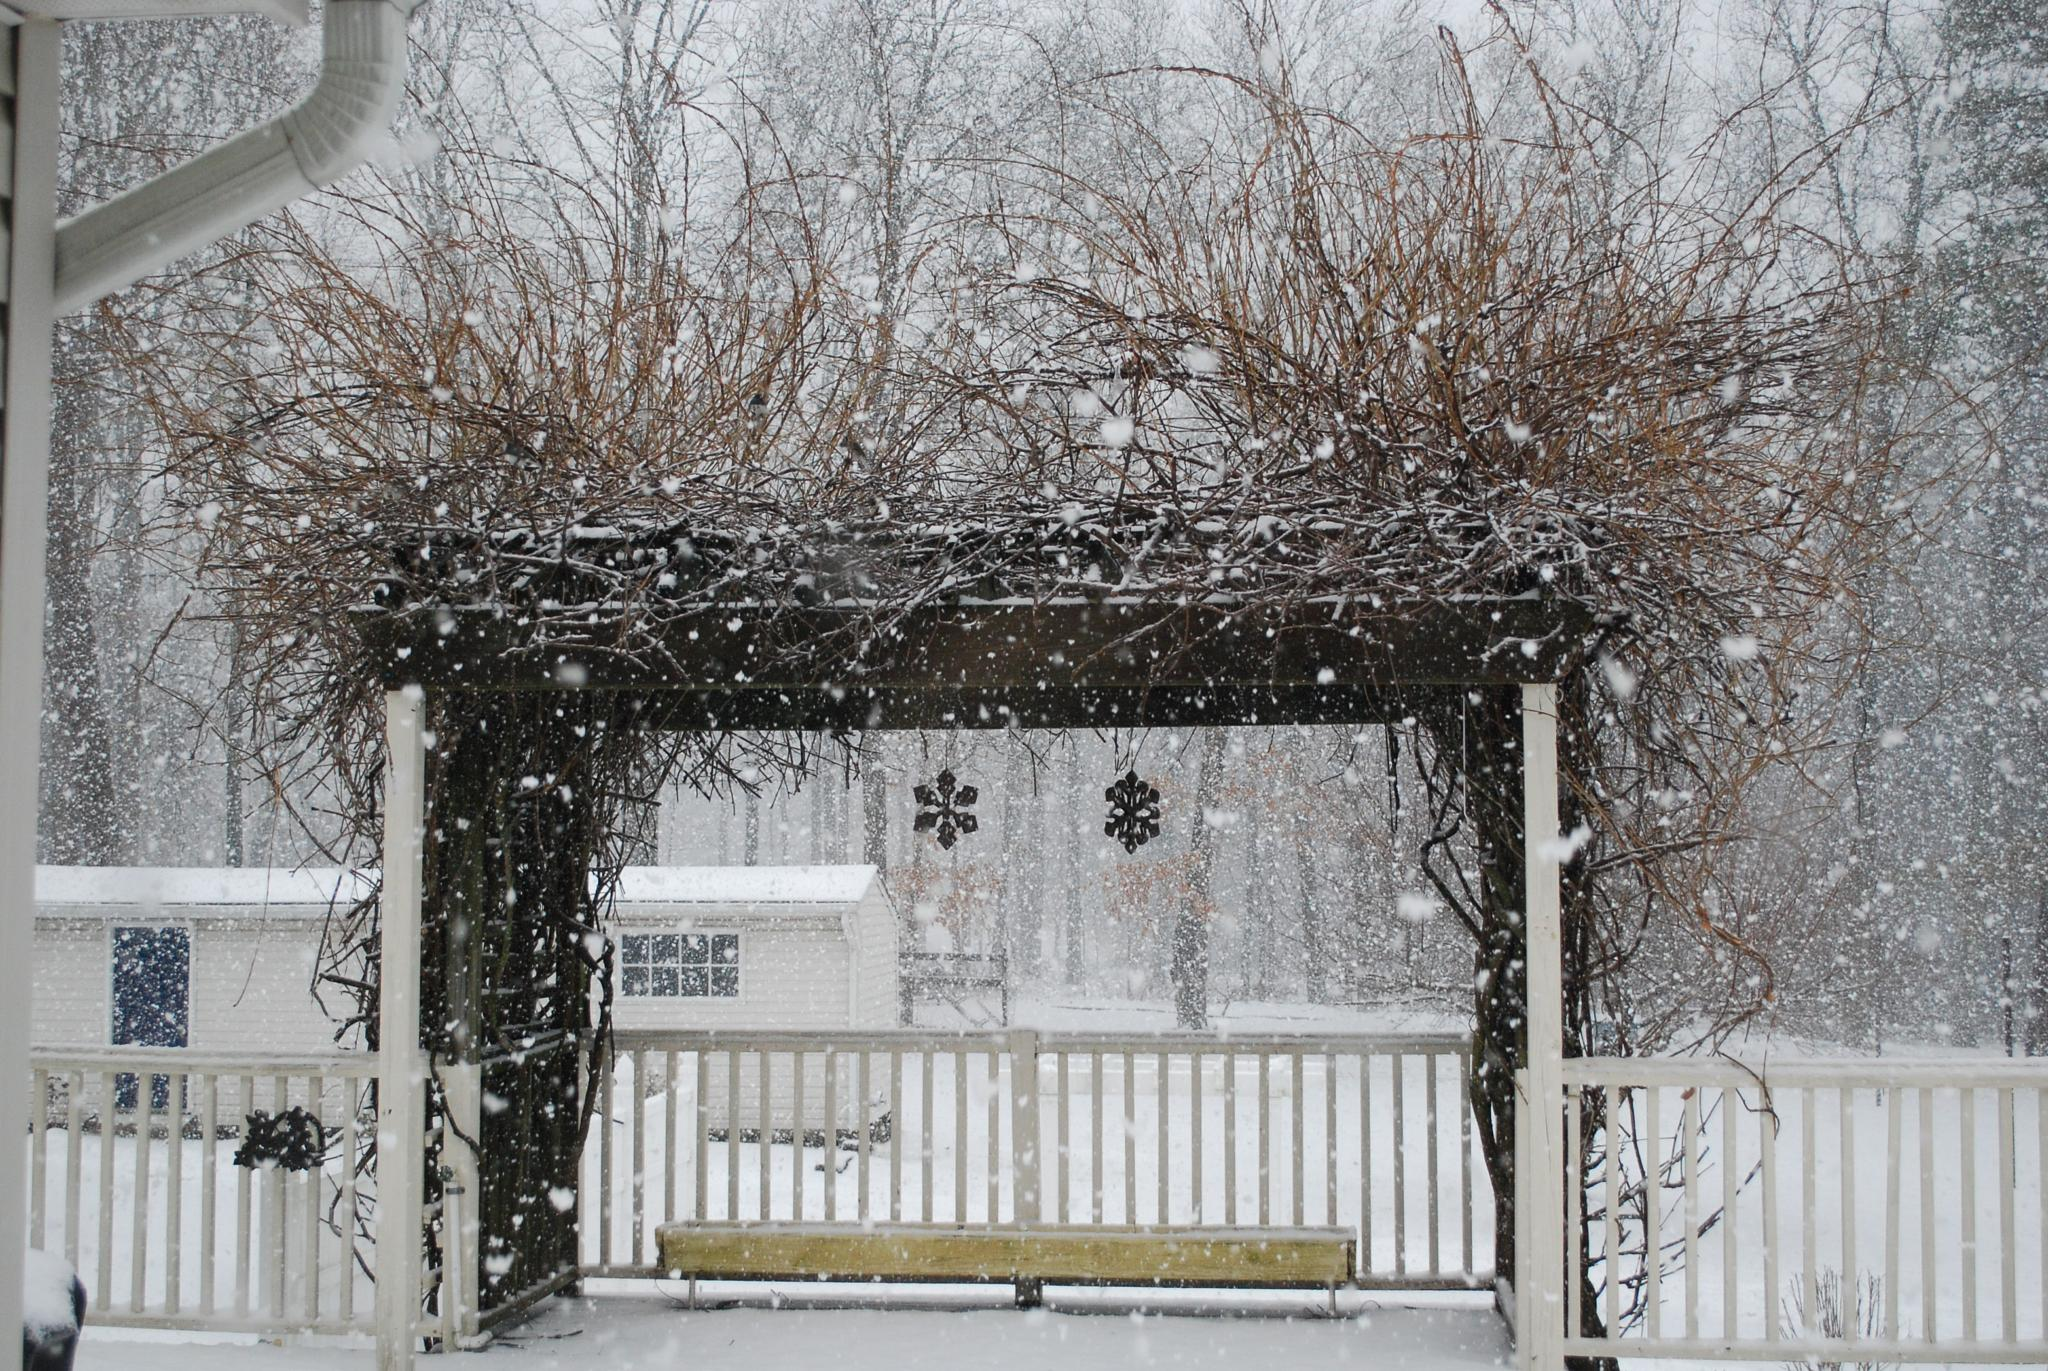 Jumbo Snow Flakes on the pergola, Jackson NJ by kathi.britske